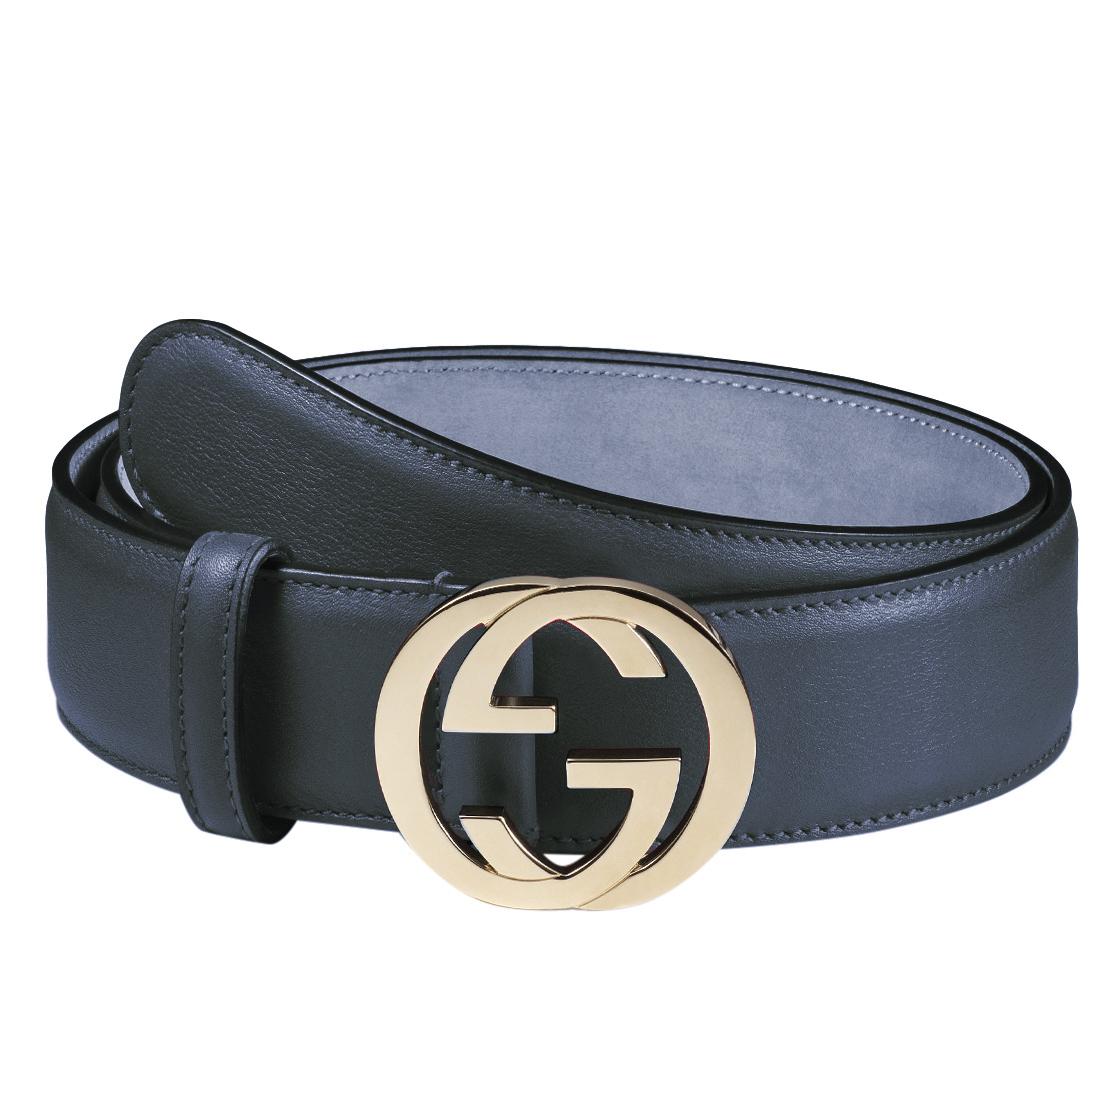 Gucci Navy Blue Leather Belt